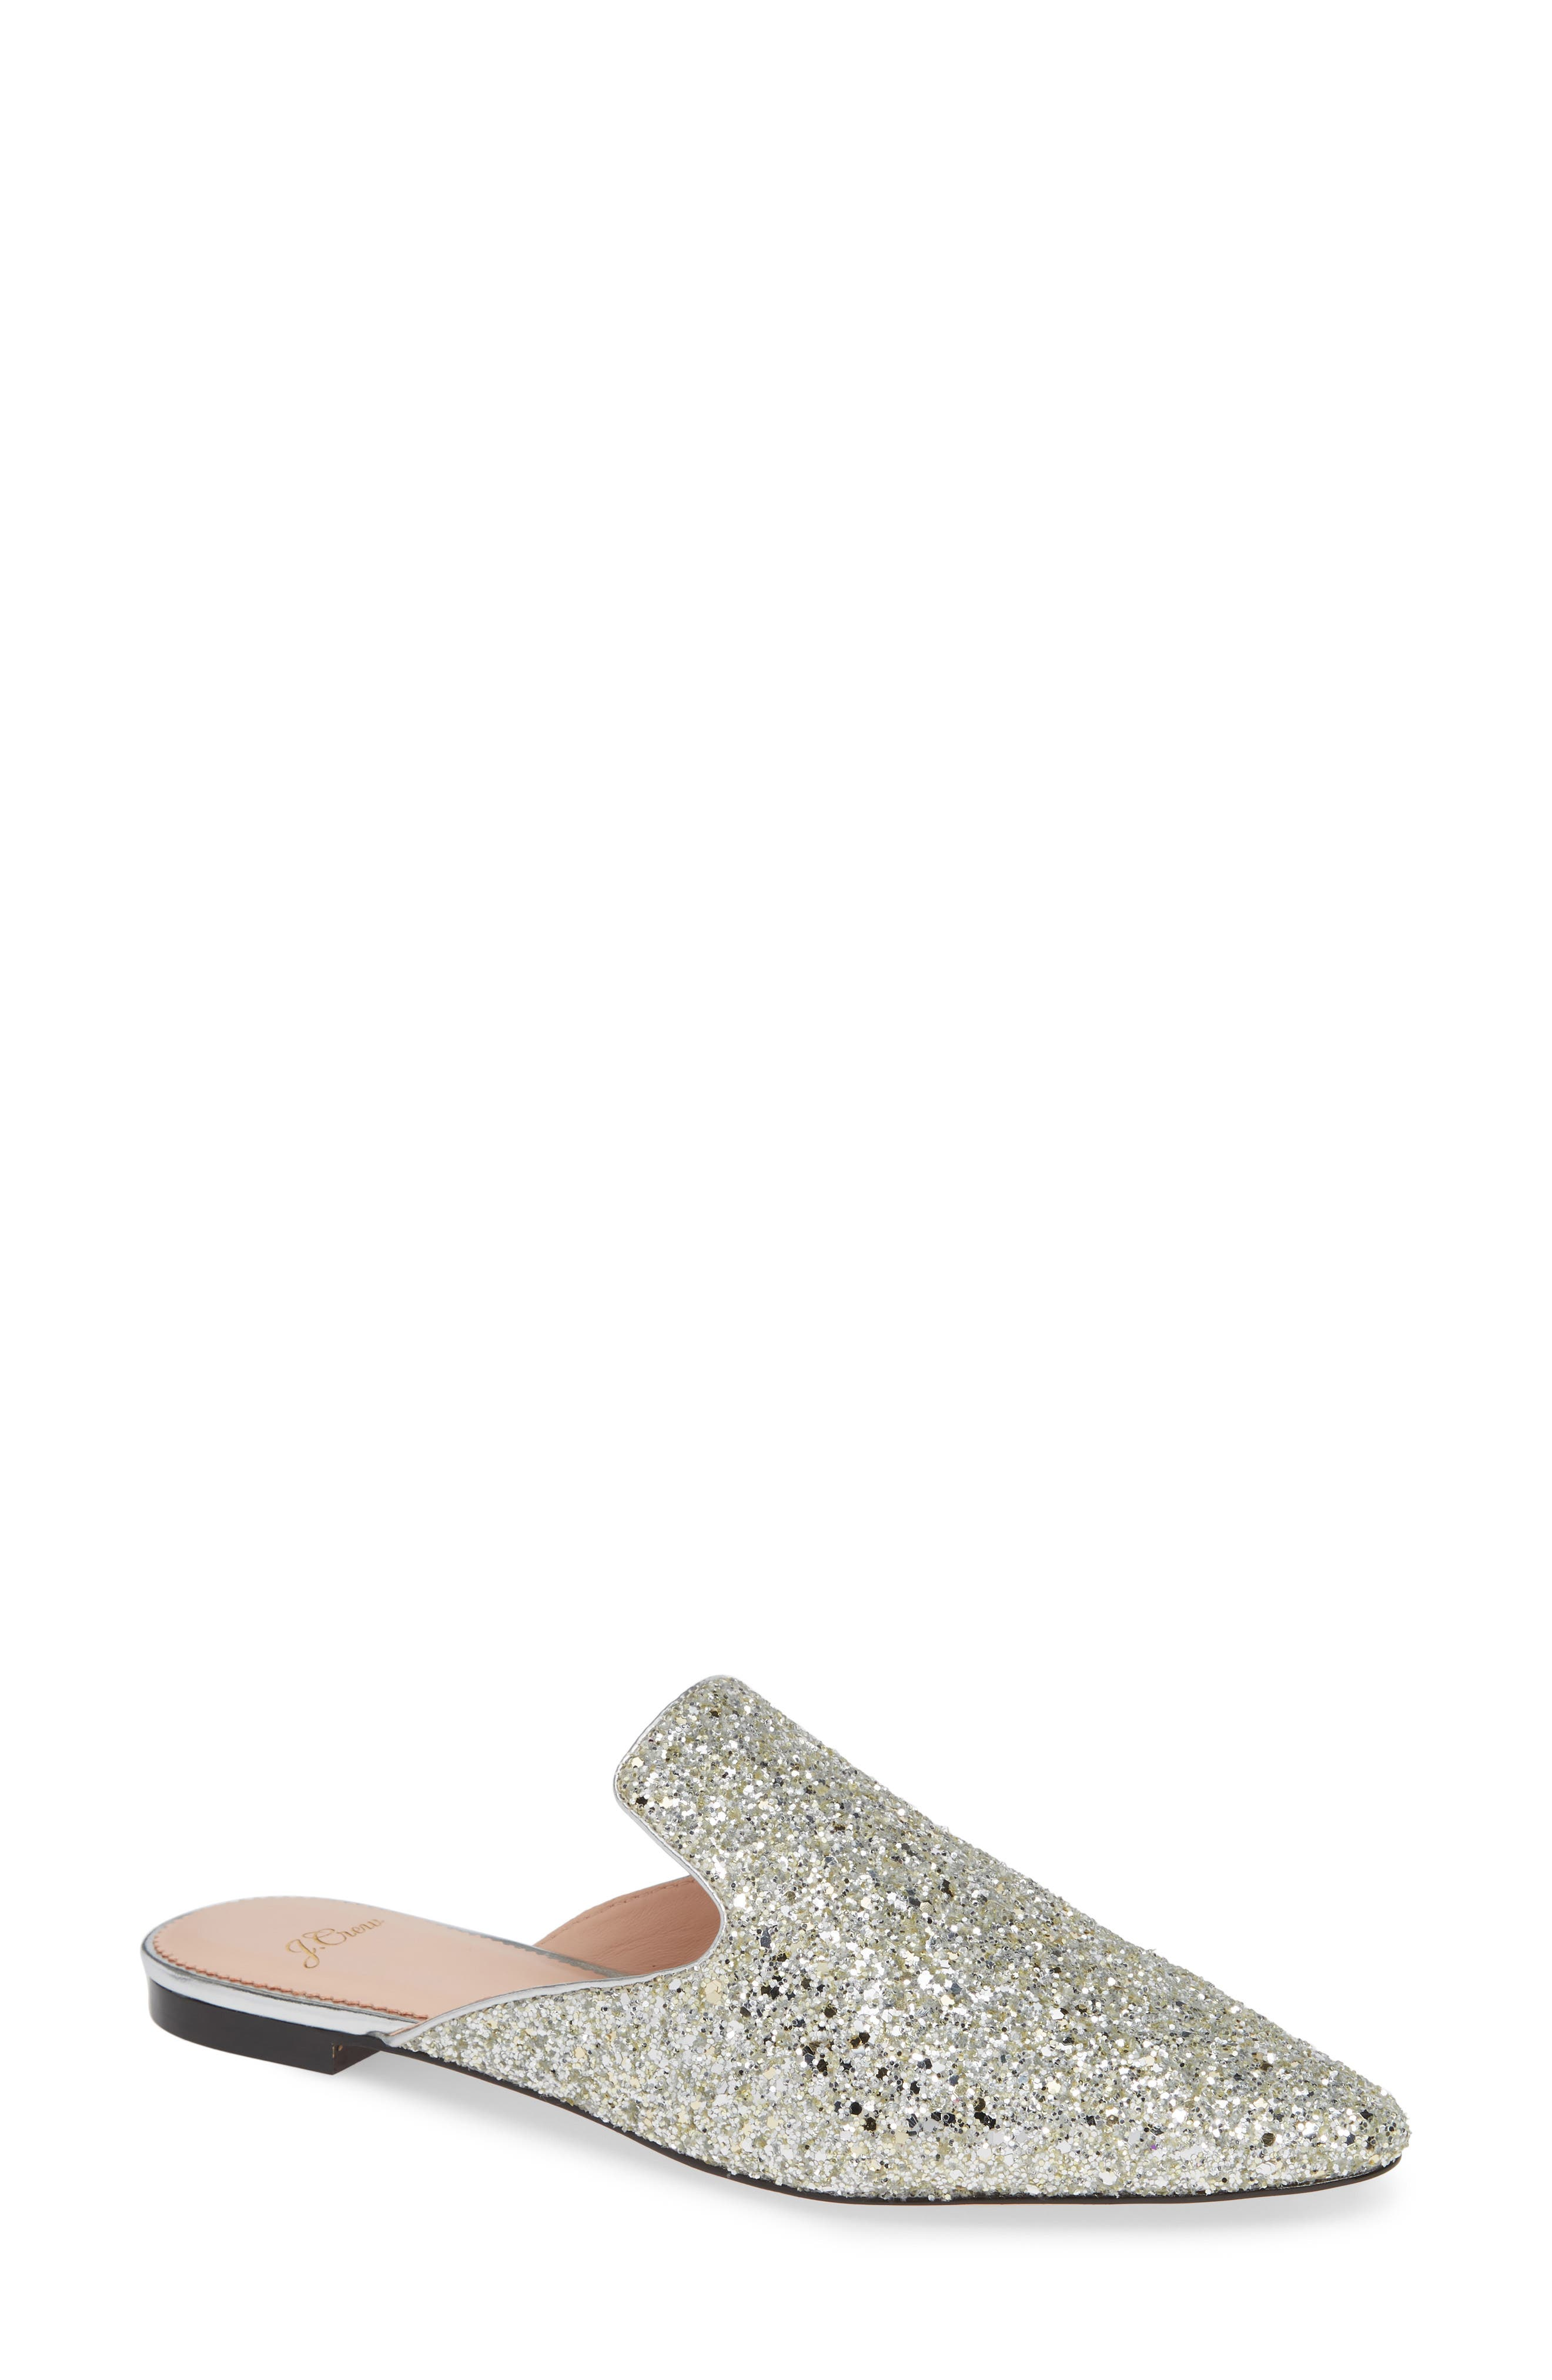 Pointy Toe Slide,                         Main,                         color, SILVER GLITTER